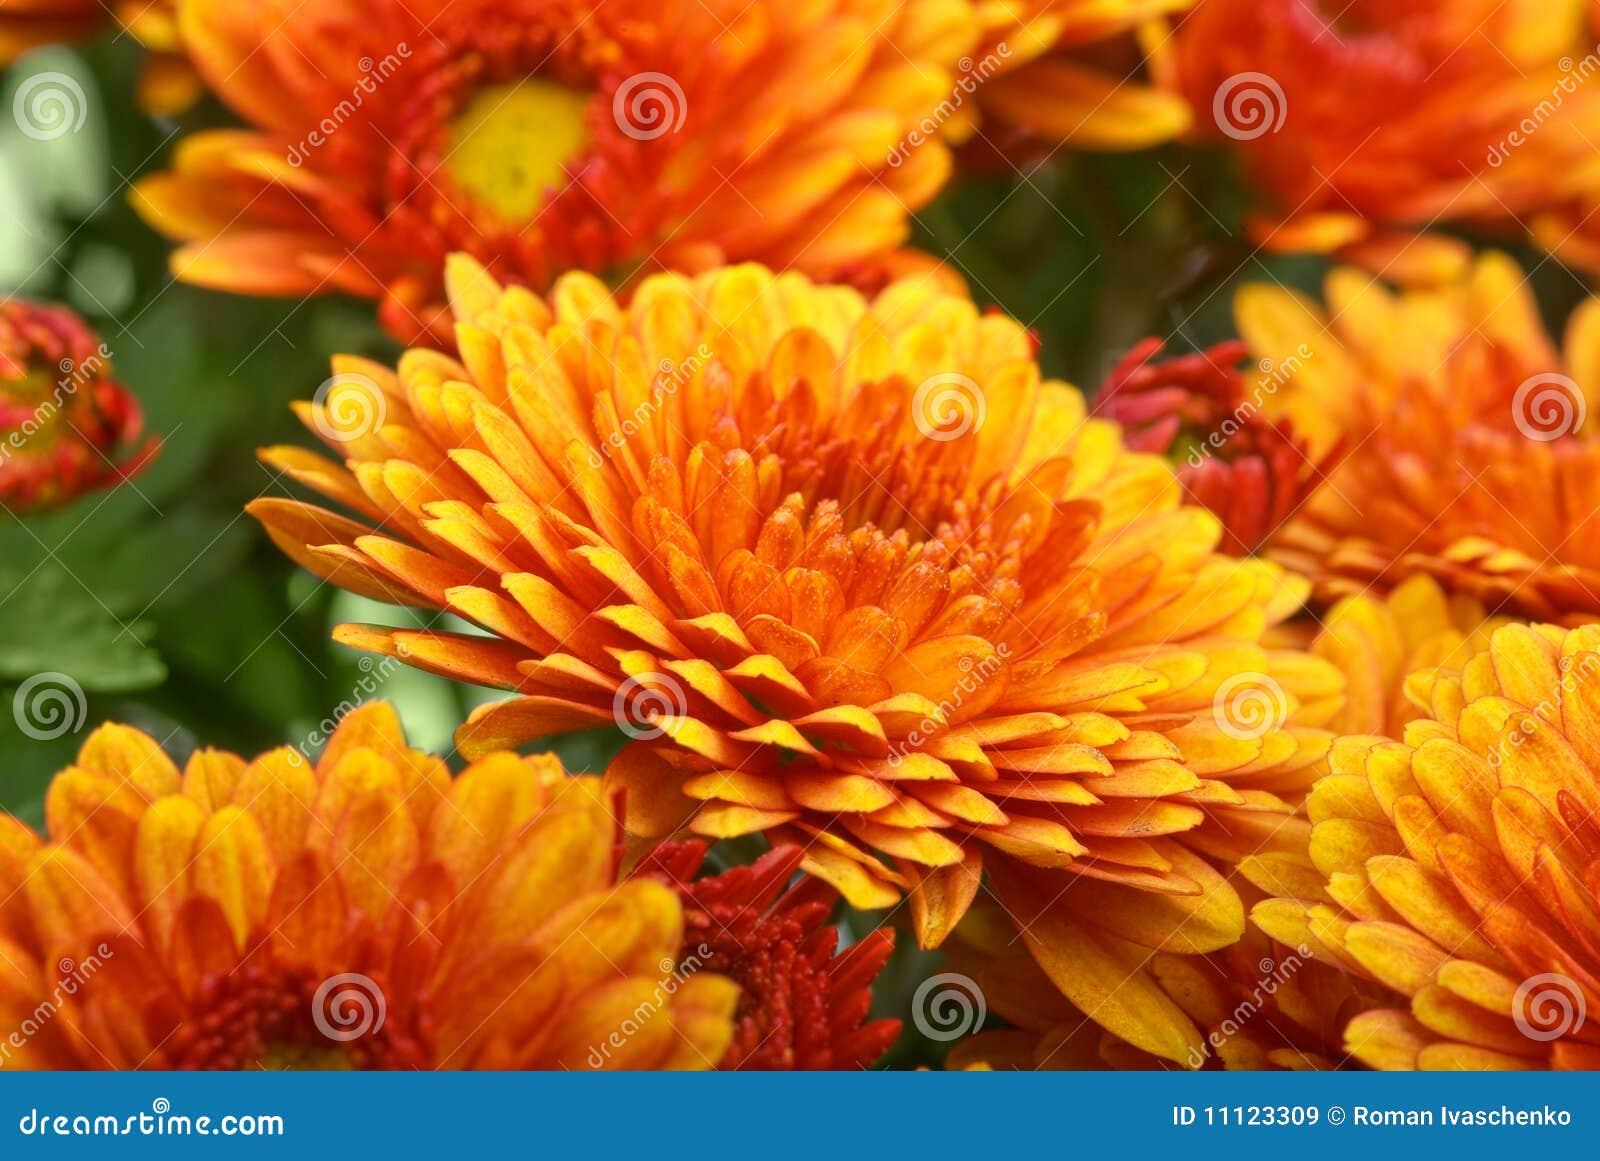 Flor anaranjada del crisantemo